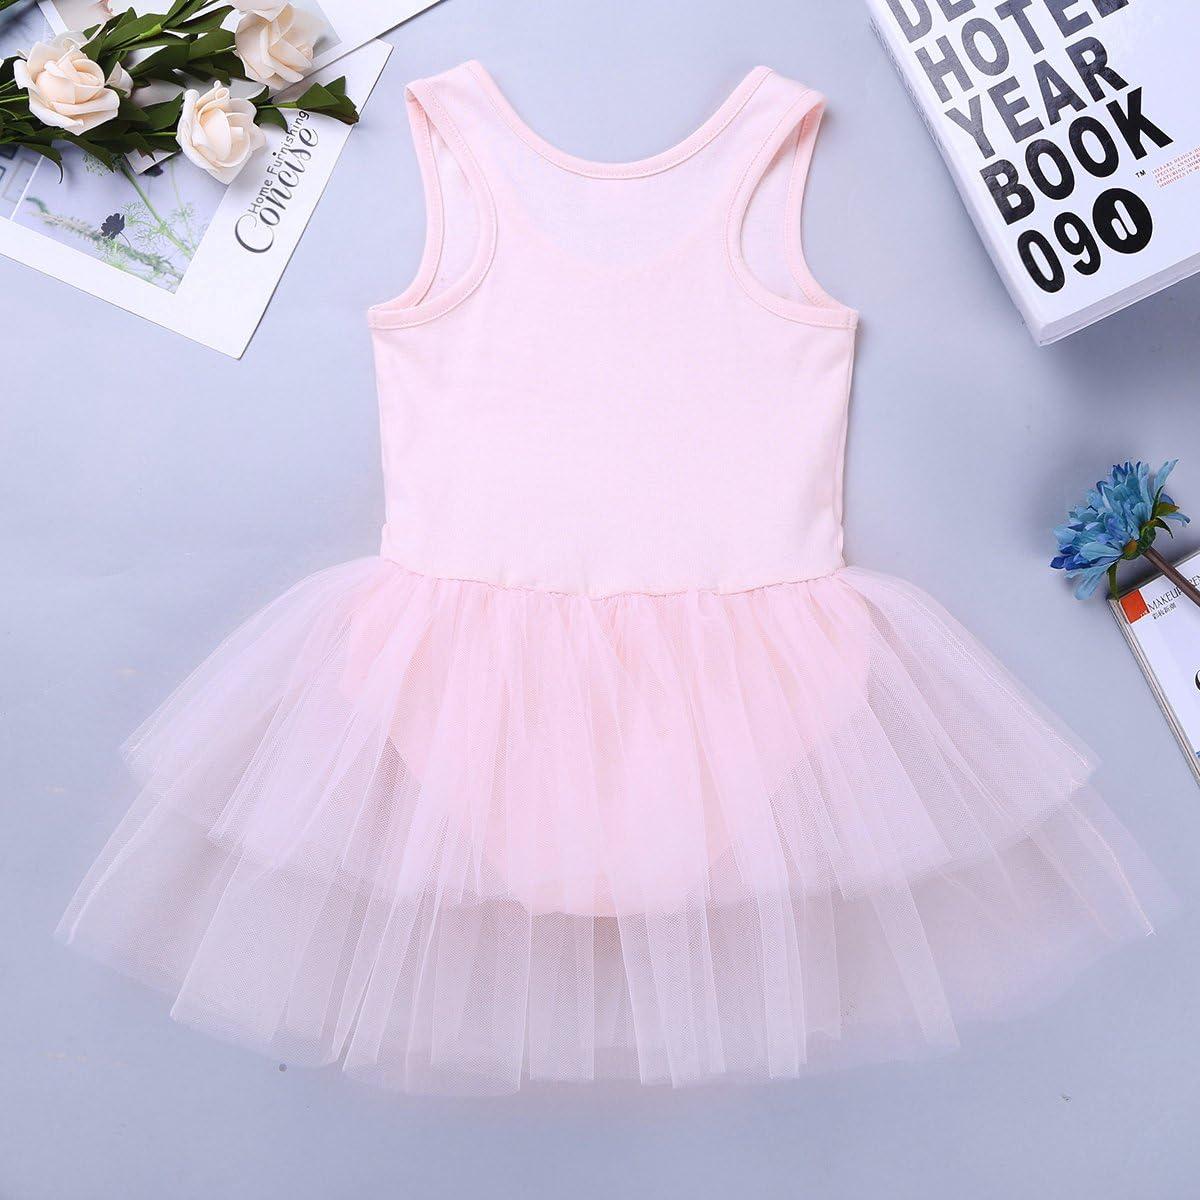 iEFiEL Girls Cotton Tank Top Tiered Mesh Tutu Skirt Ballet Dance Gymnastics Leotard Layered Dress